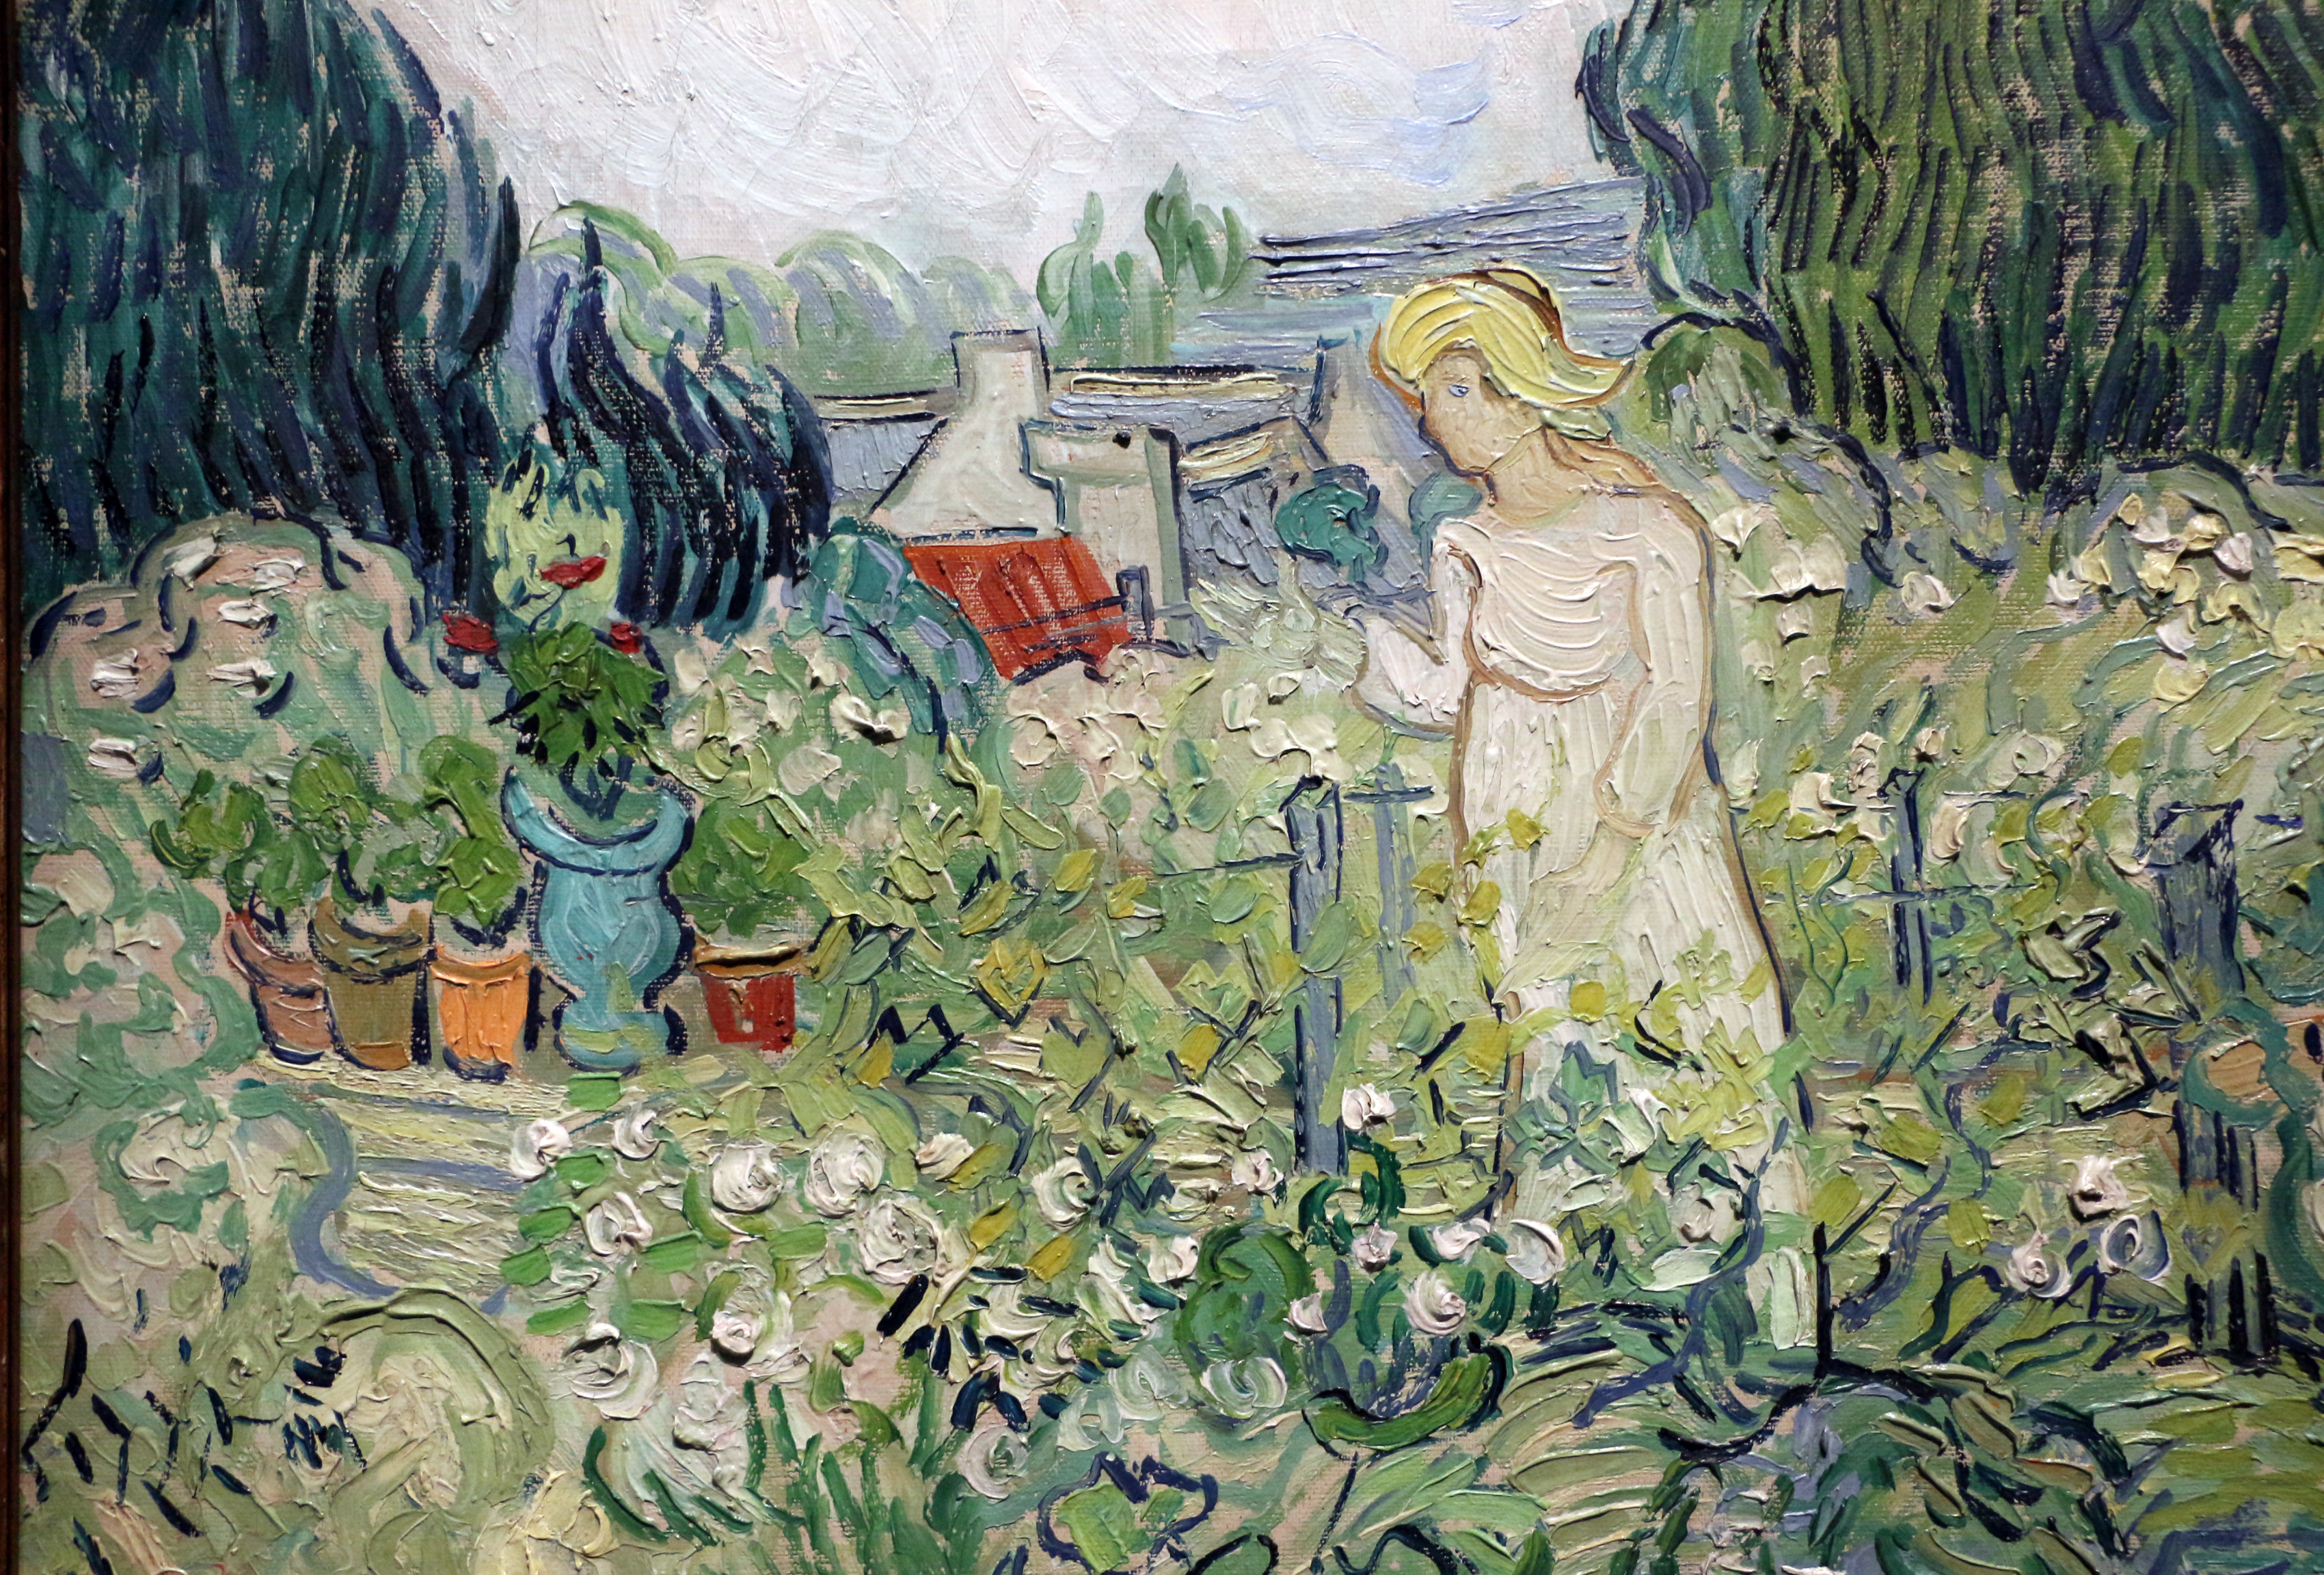 File:Vincent Van Gogh, Mademoiselle Gachet Nel Suo Giardino Ad Auvers Sur